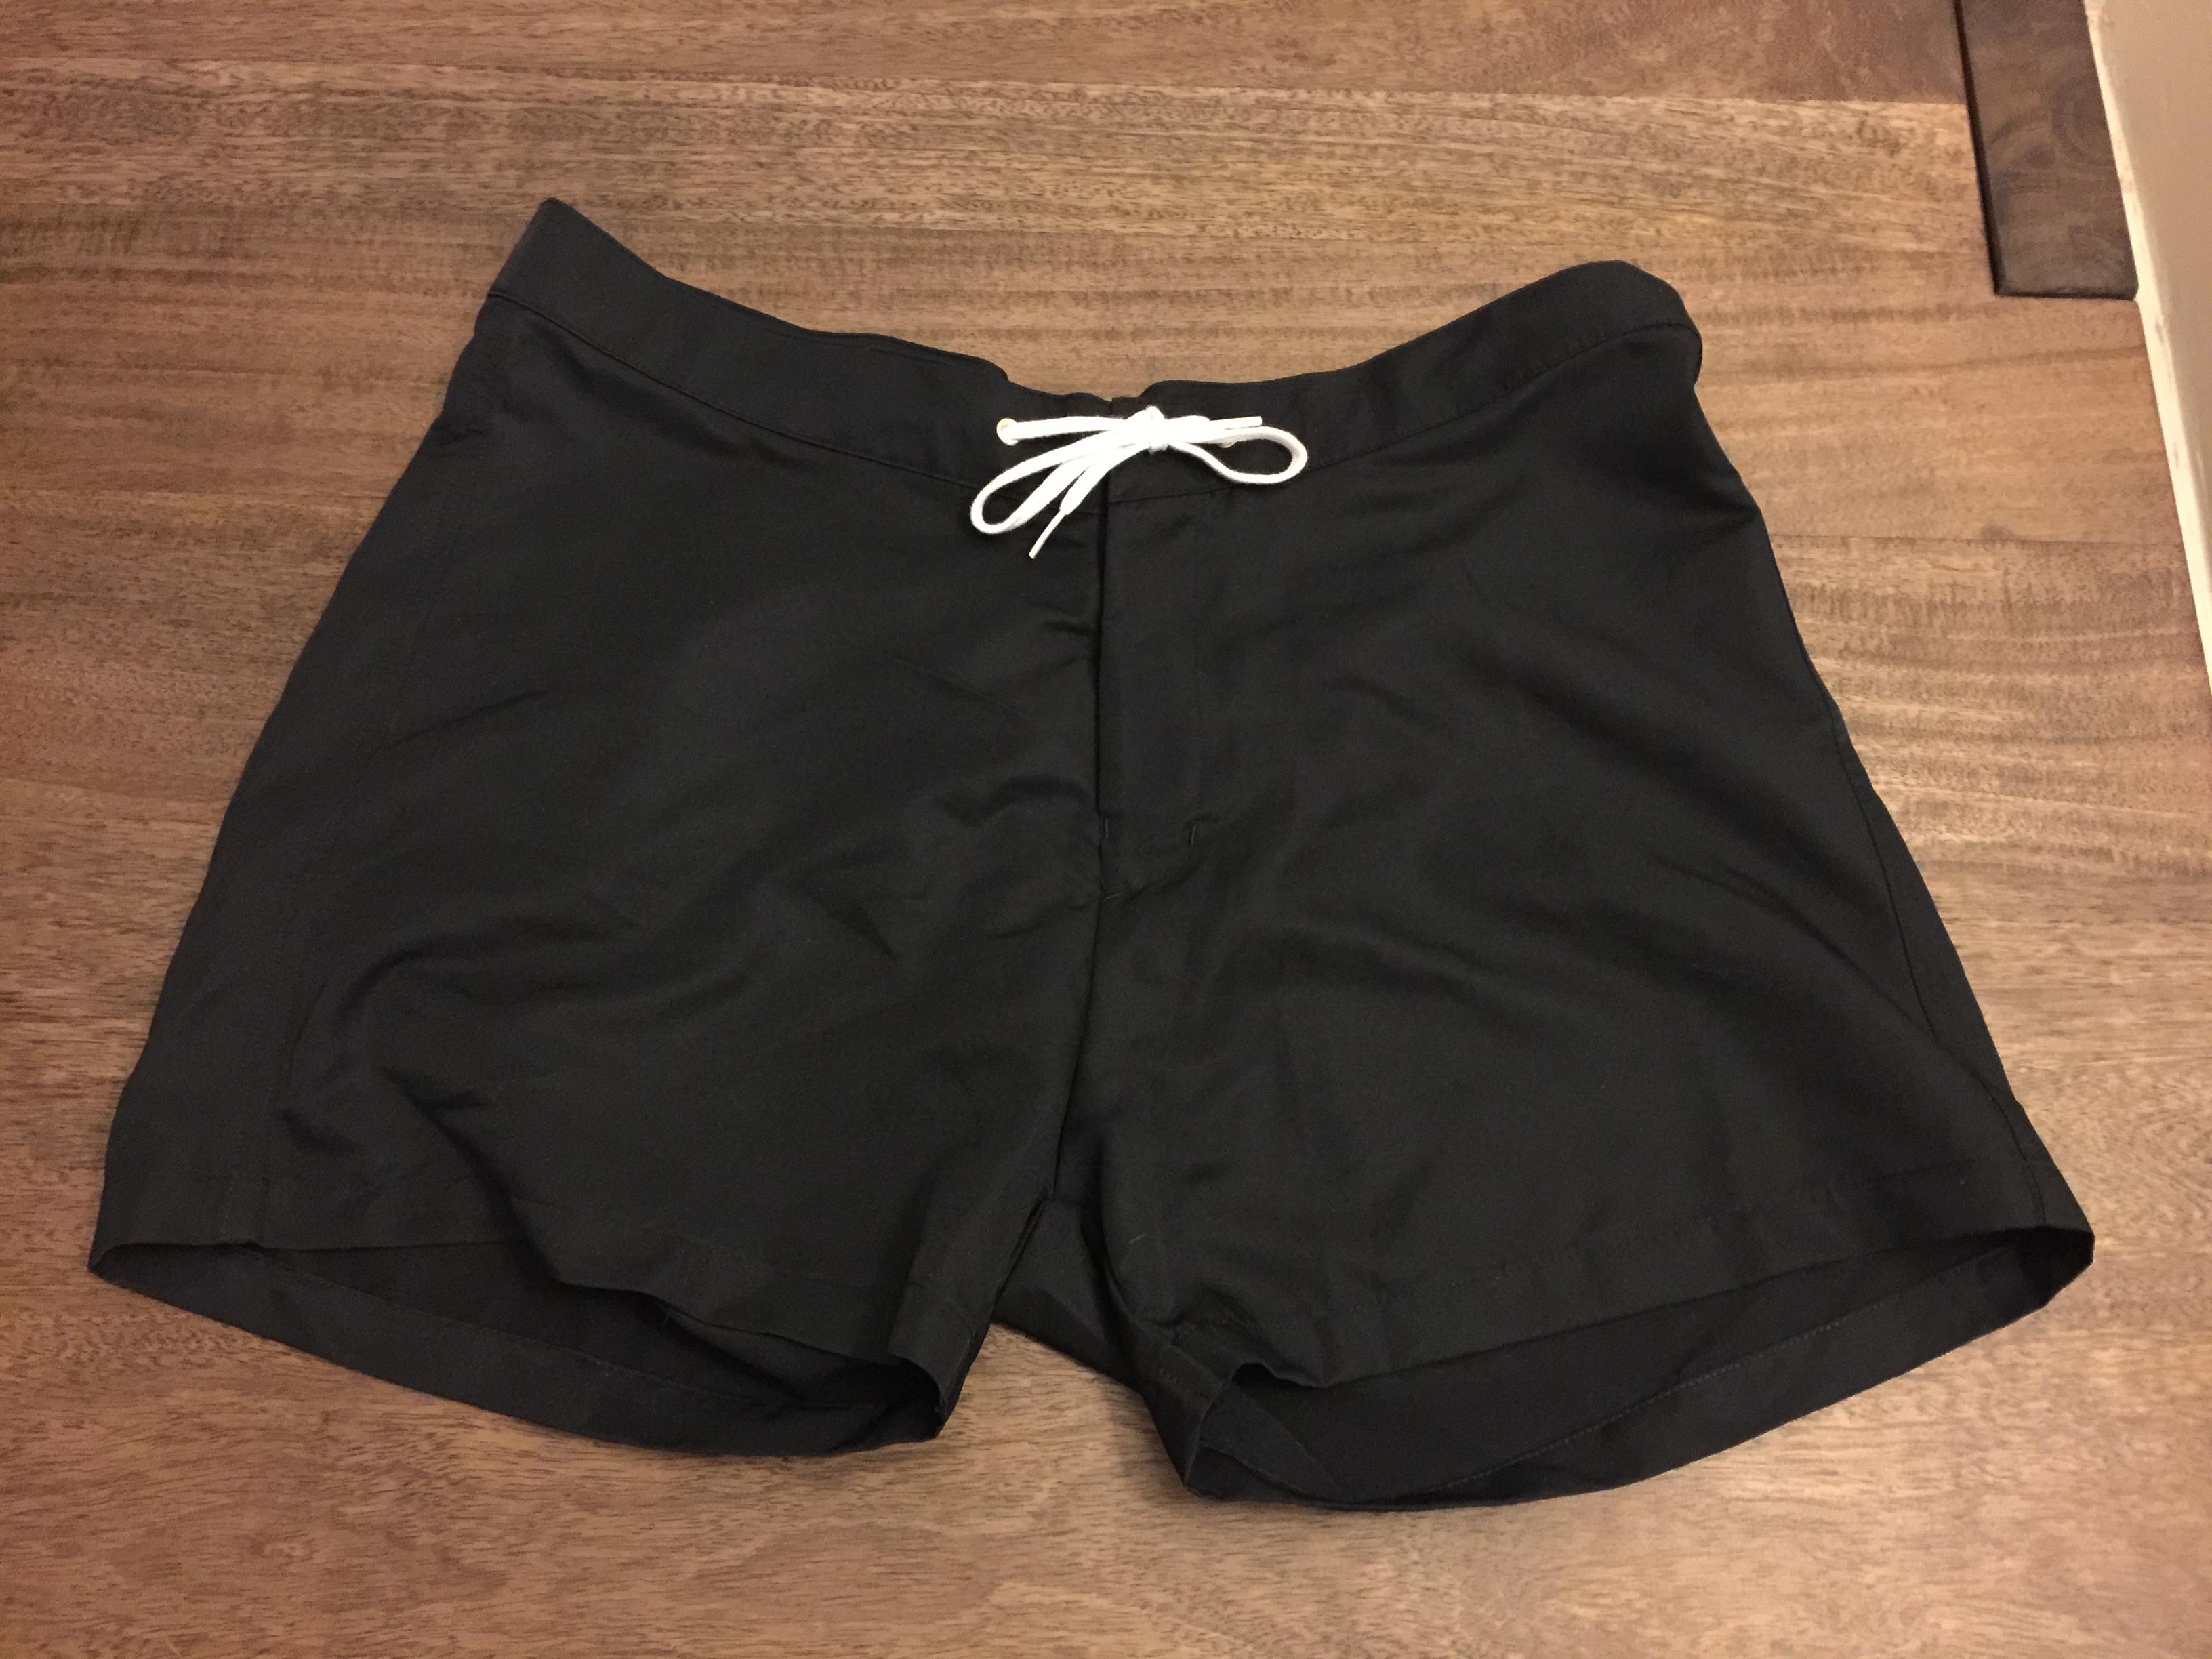 4f986b427d American Apparel Swim Shorts   Grailed